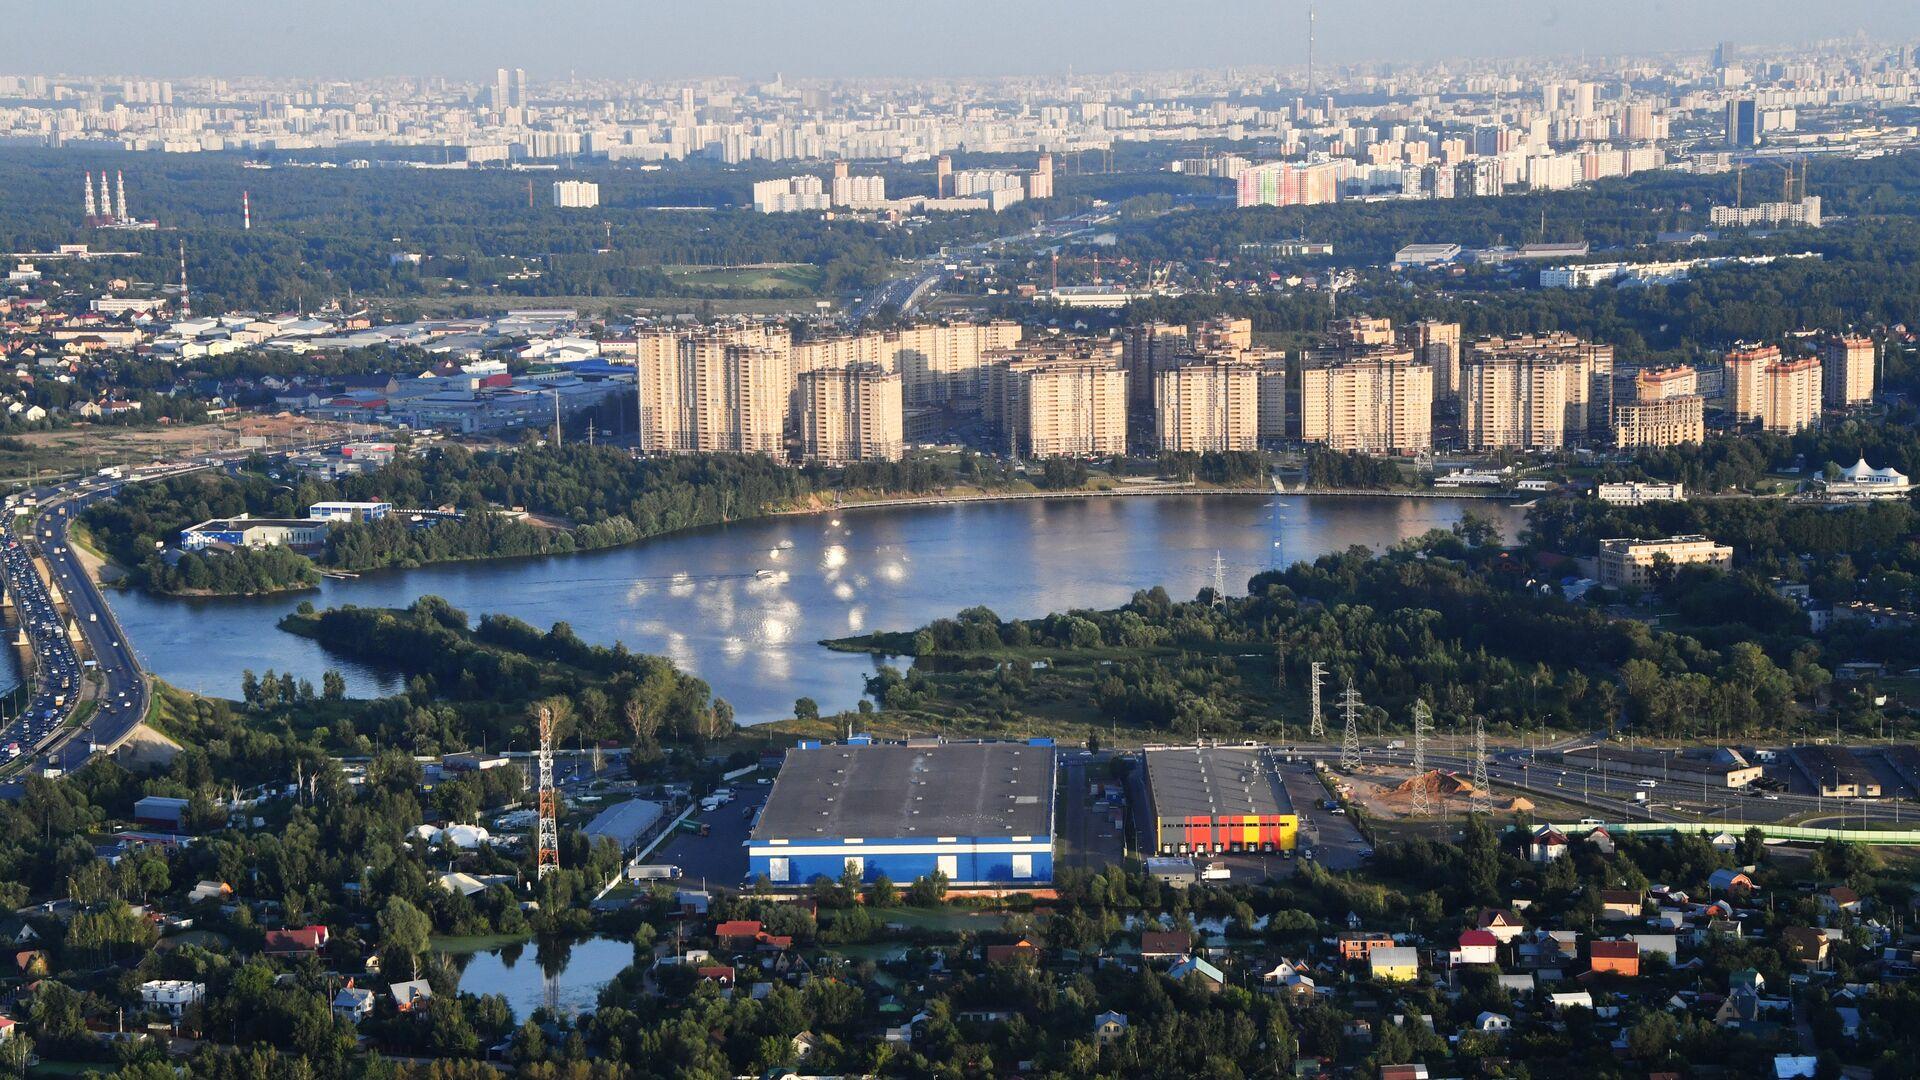 Застройка в районе канала имени Москвы - РИА Новости, 1920, 22.07.2021